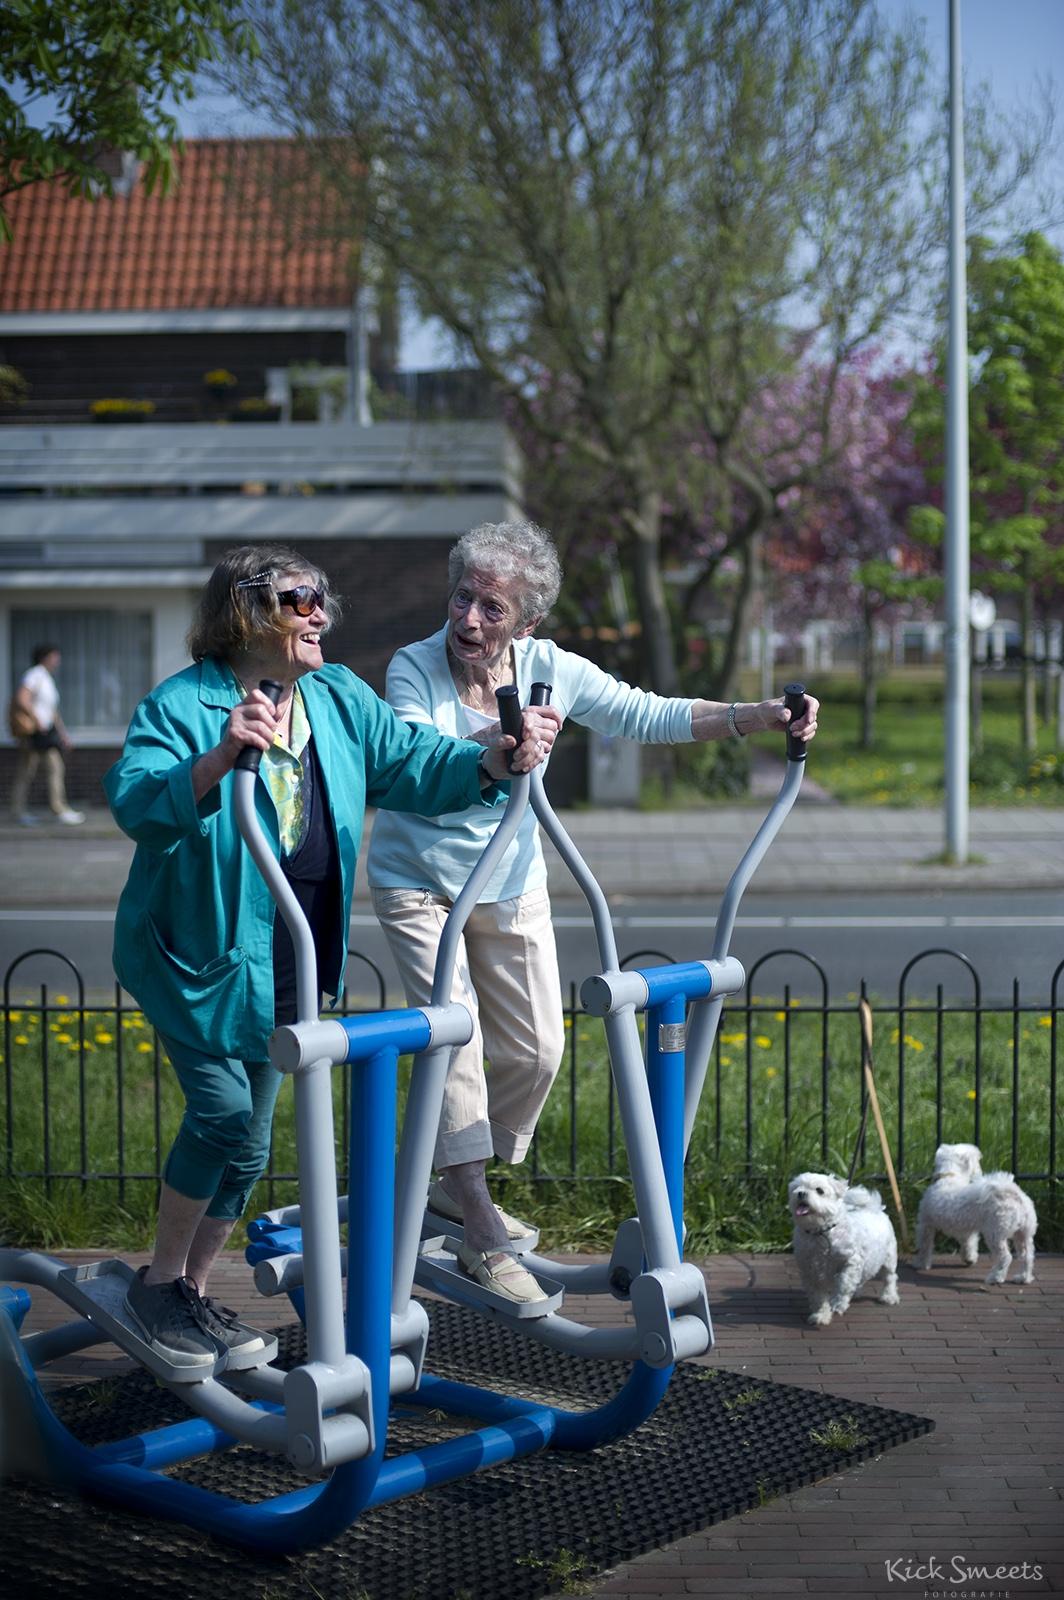 Seniorenfitness in de buitenlucht, Amsterdam